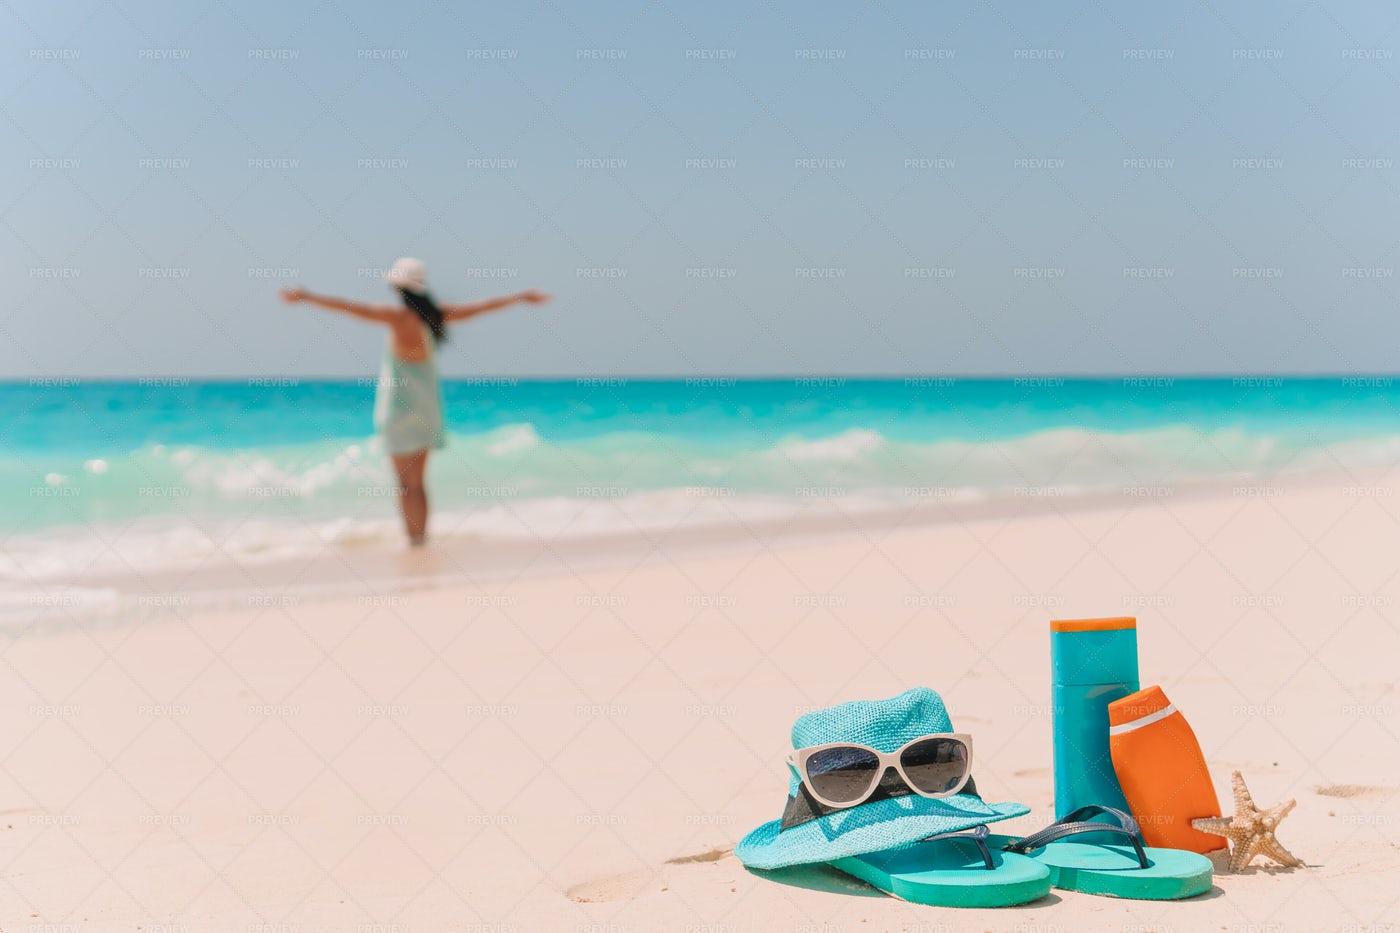 Suncream, hat, sunglasses and flip flop: Stock Photos